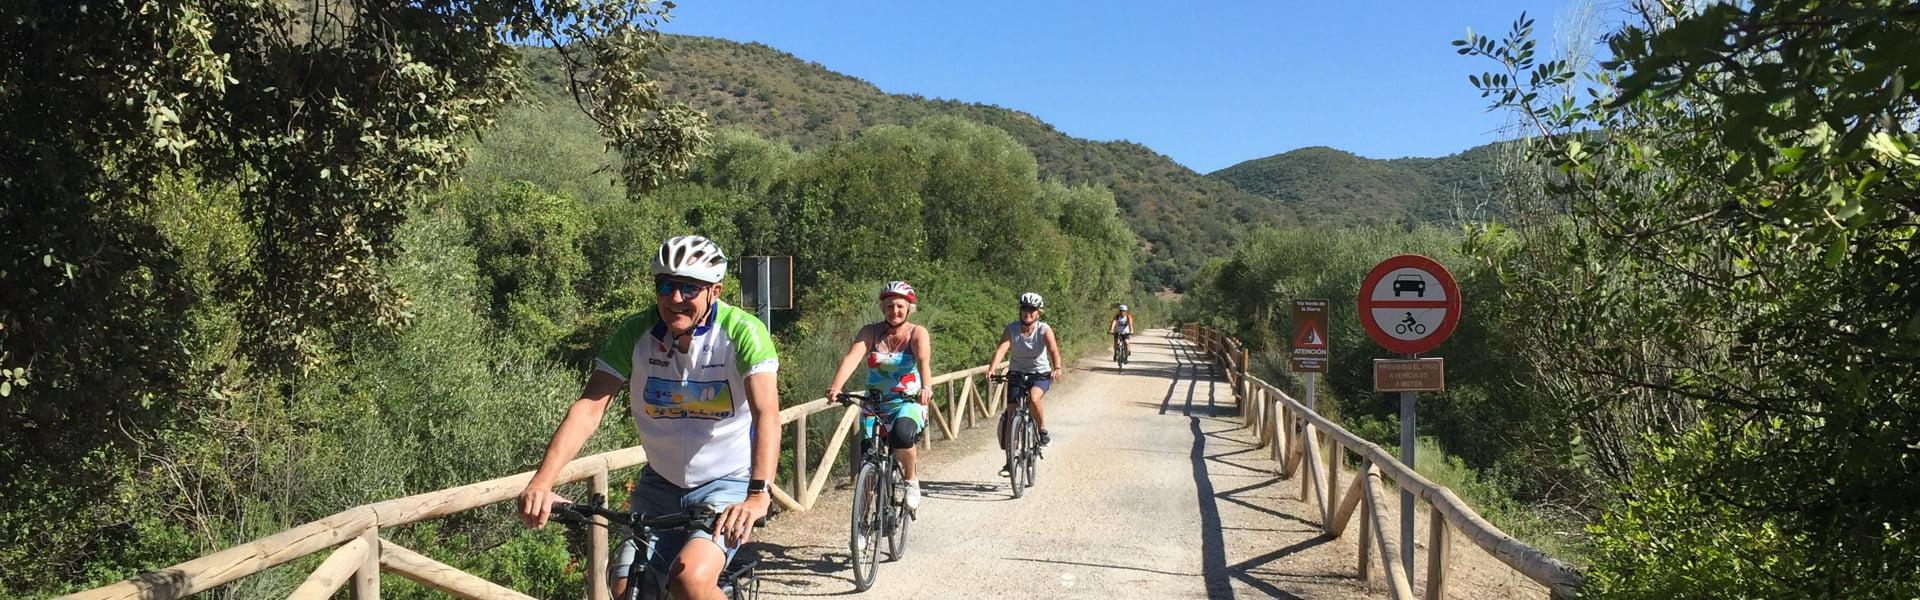 Spanje | Fietsvakantie Andalusië hoteltrektocht